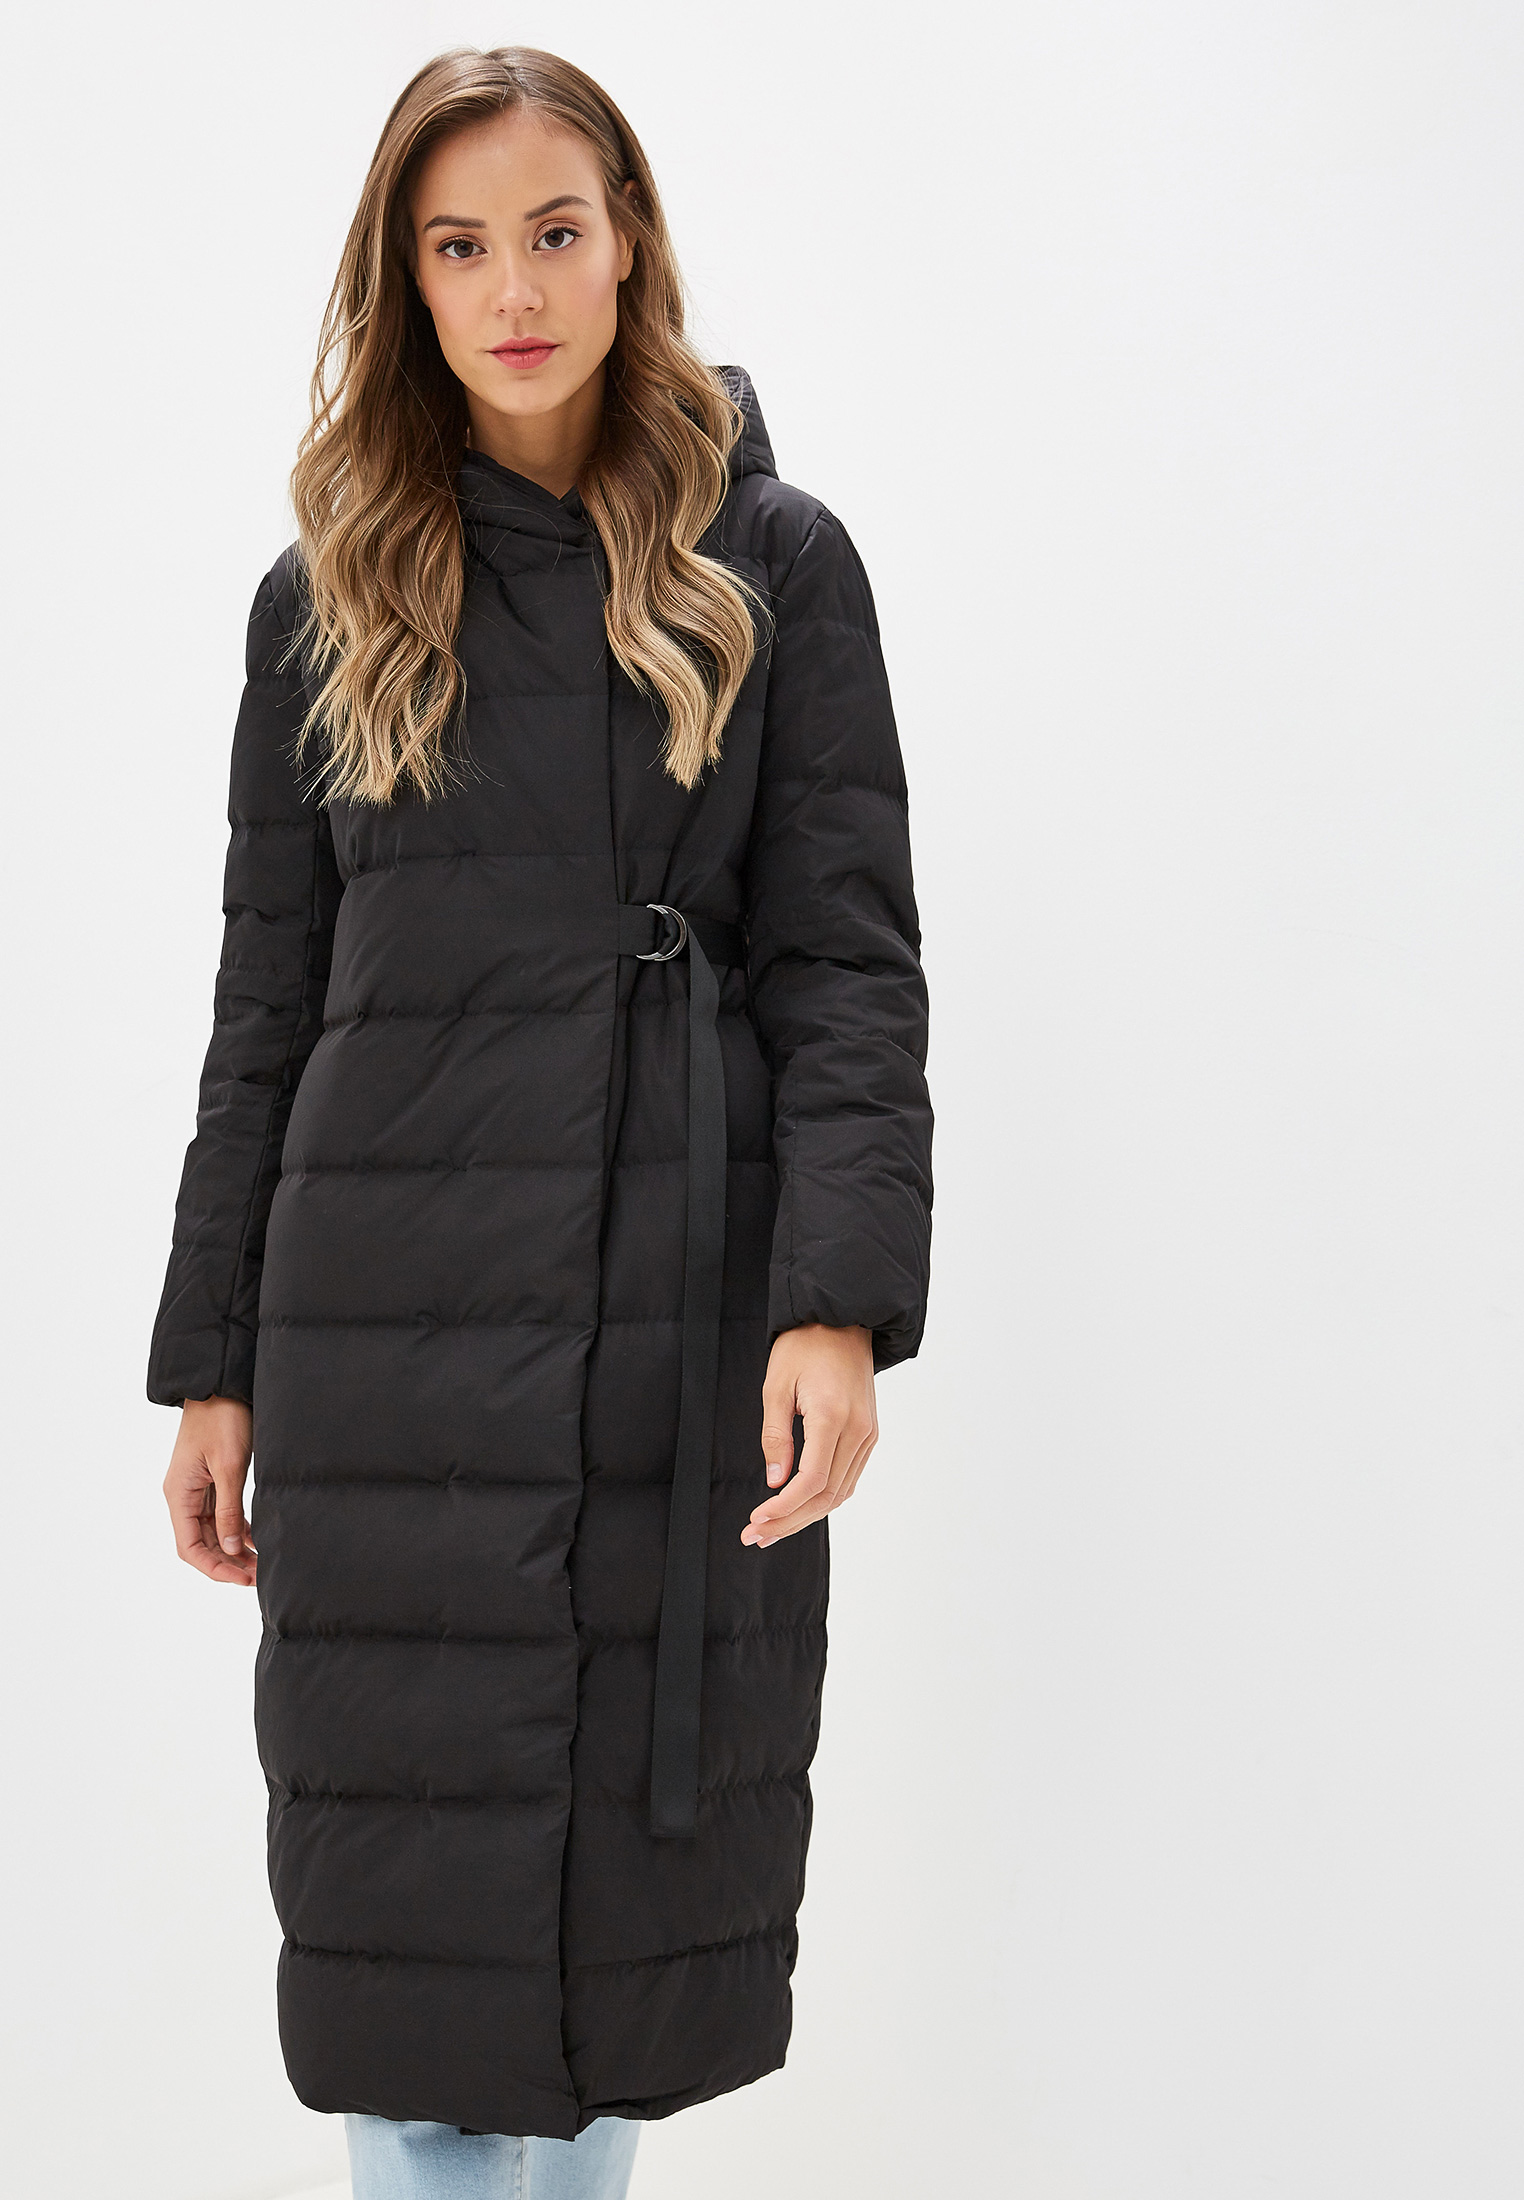 Пуховик, Savage, цвет: черный. Артикул: SA004EWGESC2. Одежда / Верхняя одежда / Пуховики и зимние куртки